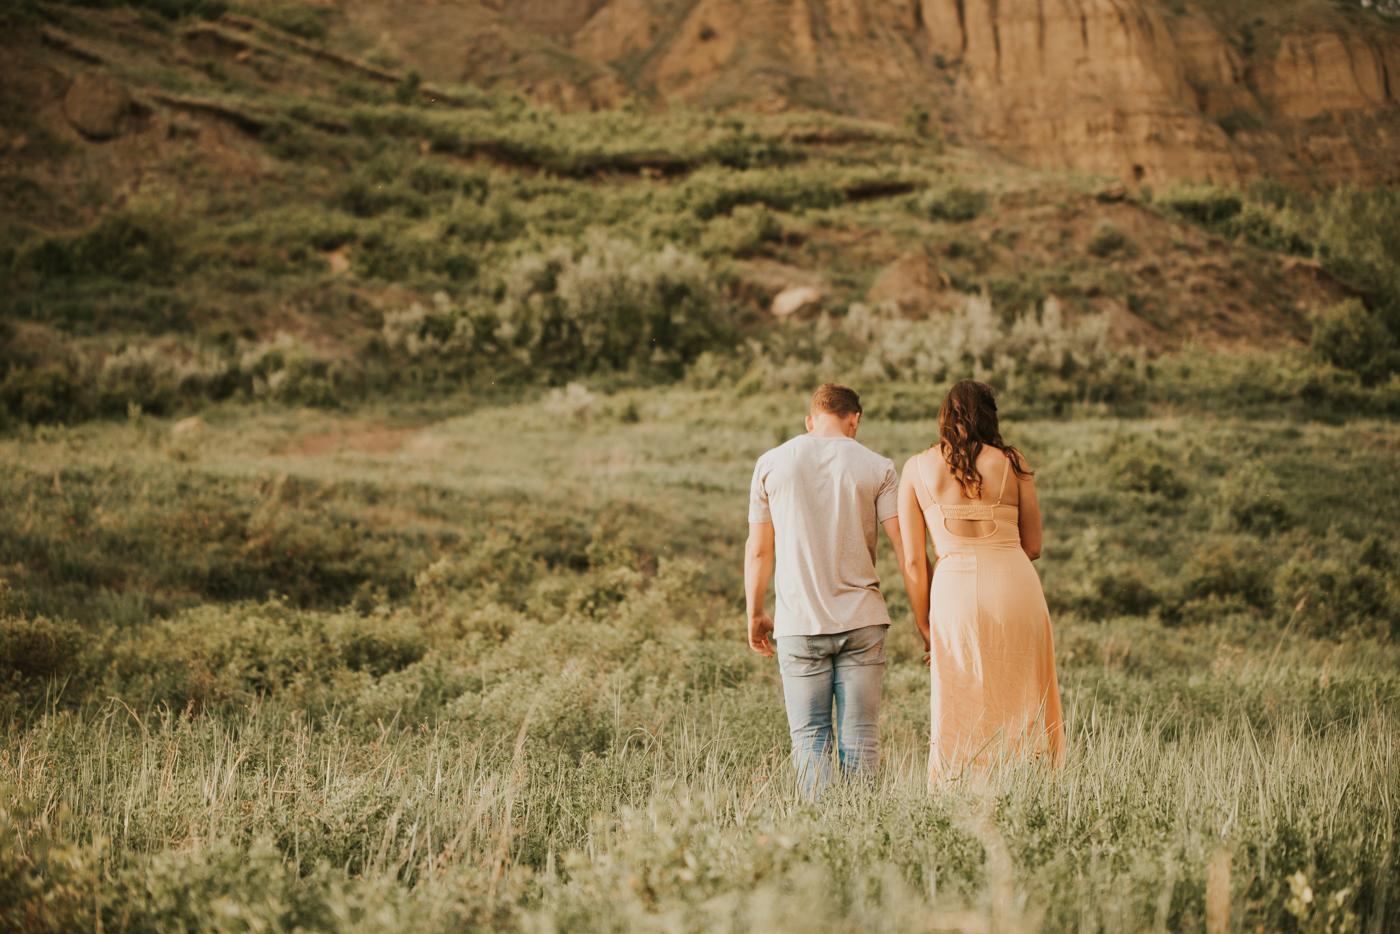 tyraephotography_photographer_wedding_elopement_engagement_photography-6253.jpg